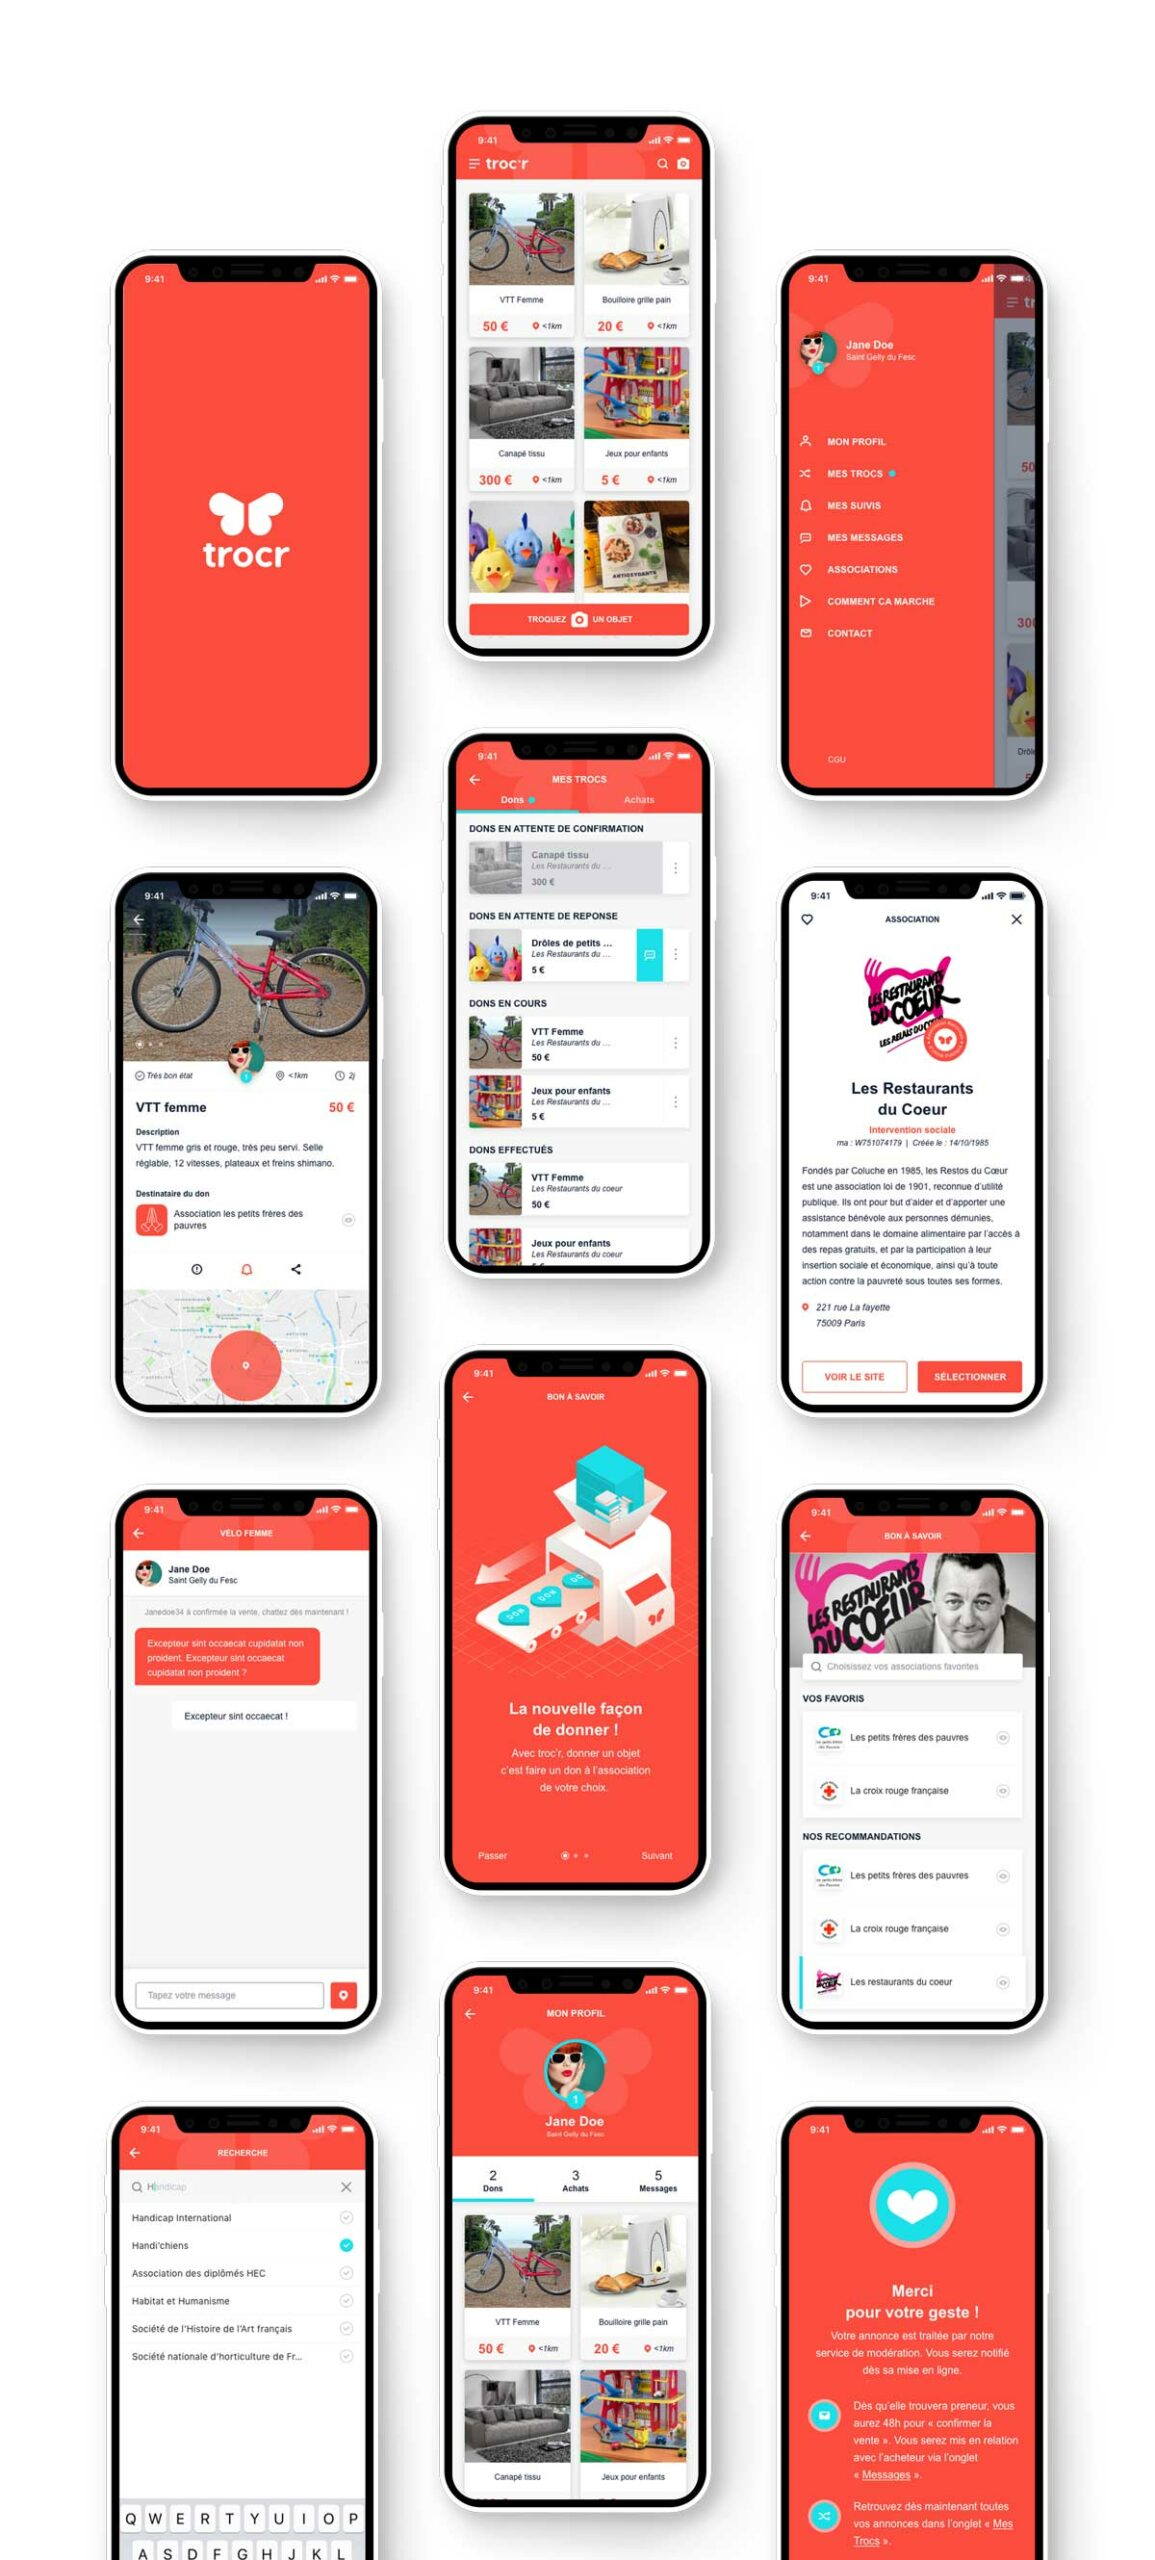 davidbeaud-trocr-app-02